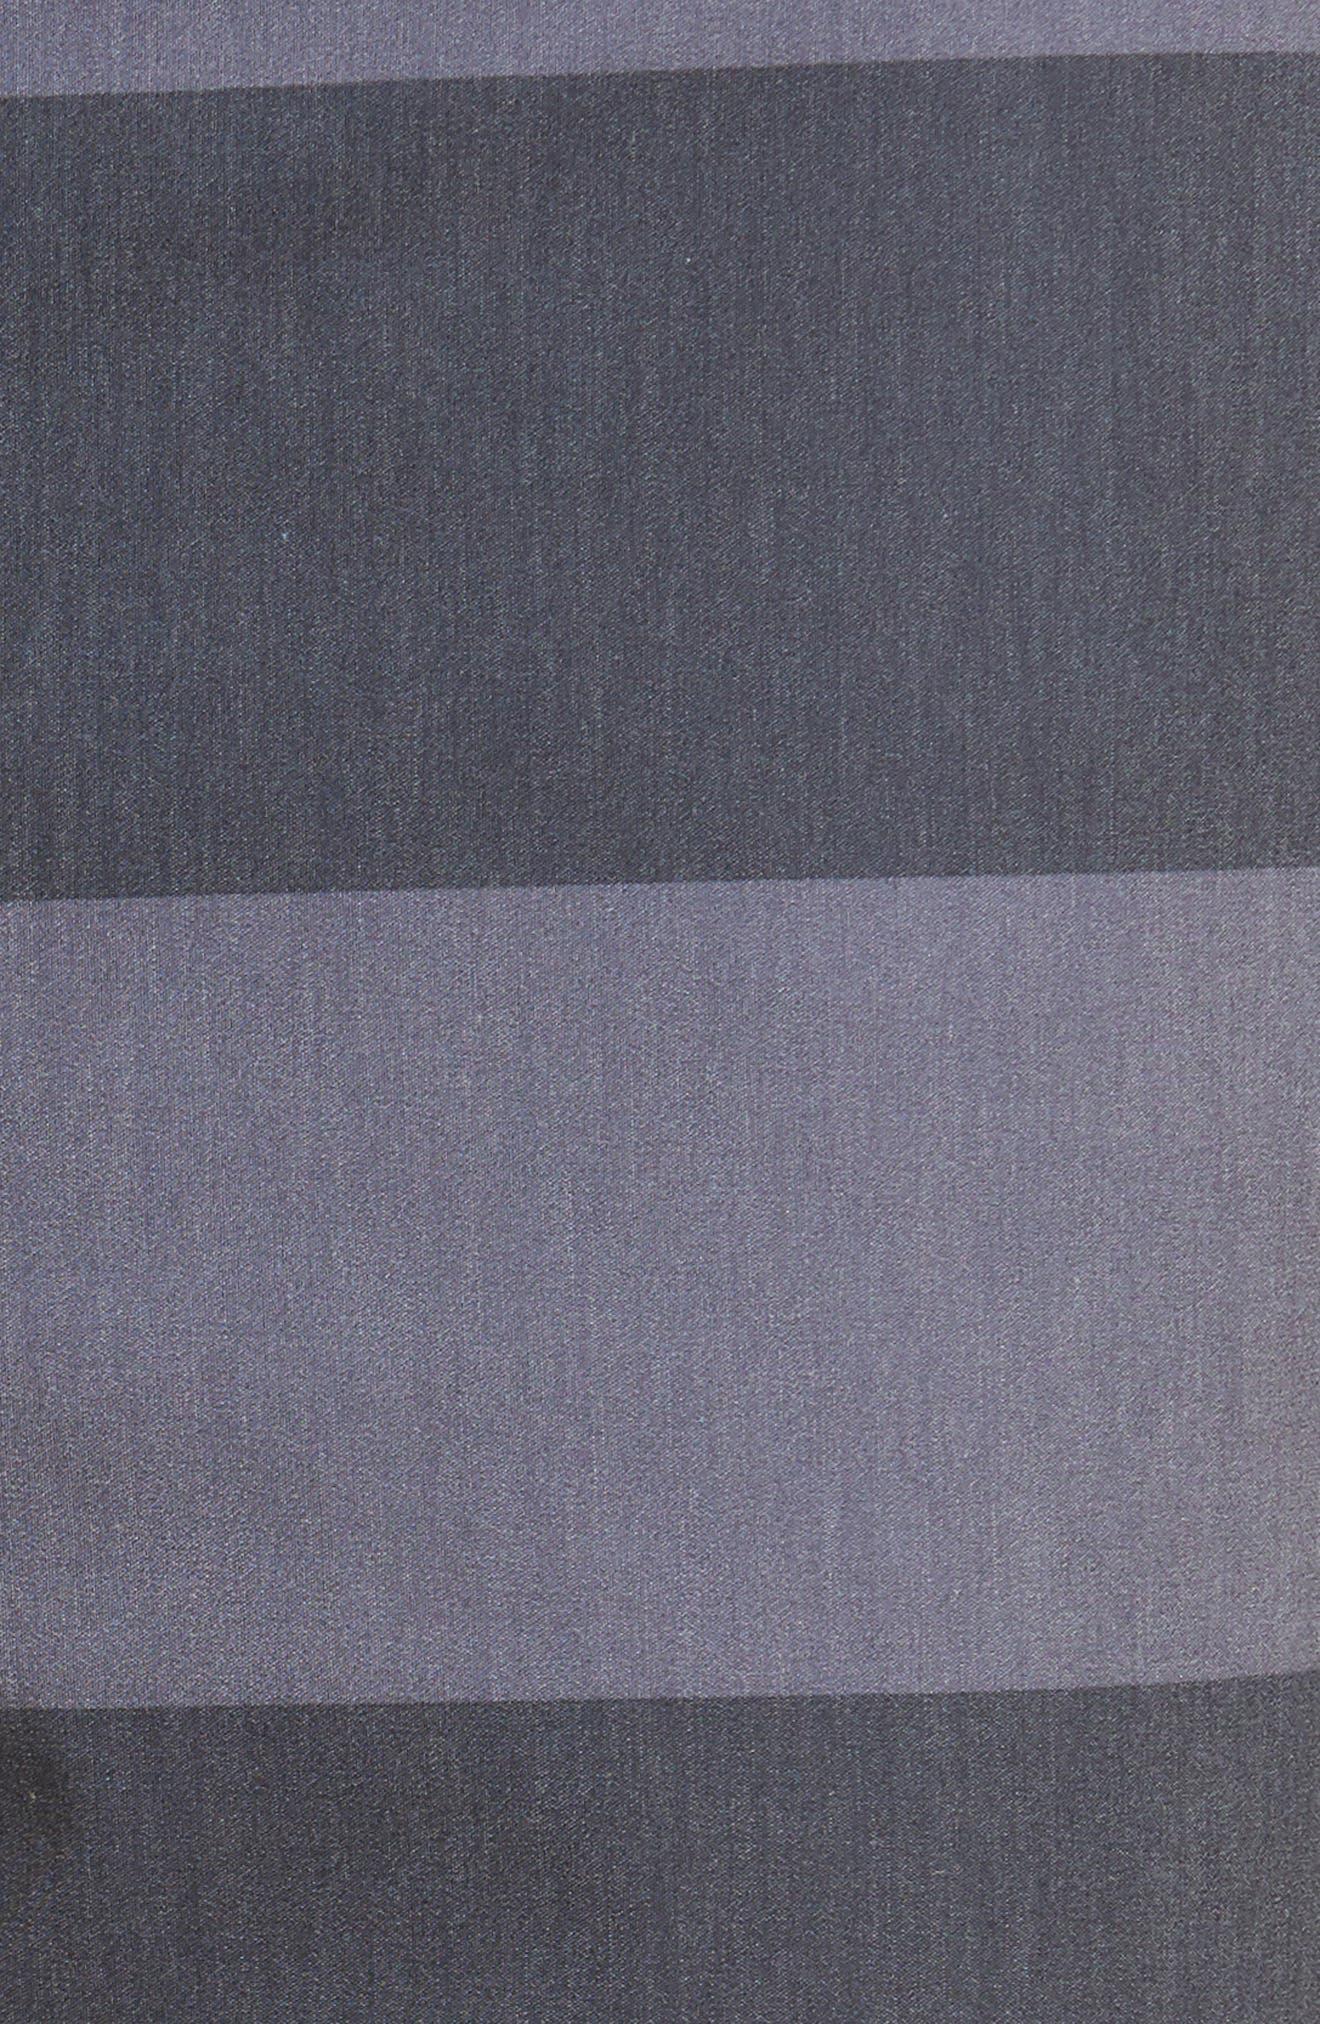 Homage Board Shorts,                             Alternate thumbnail 5, color,                             001